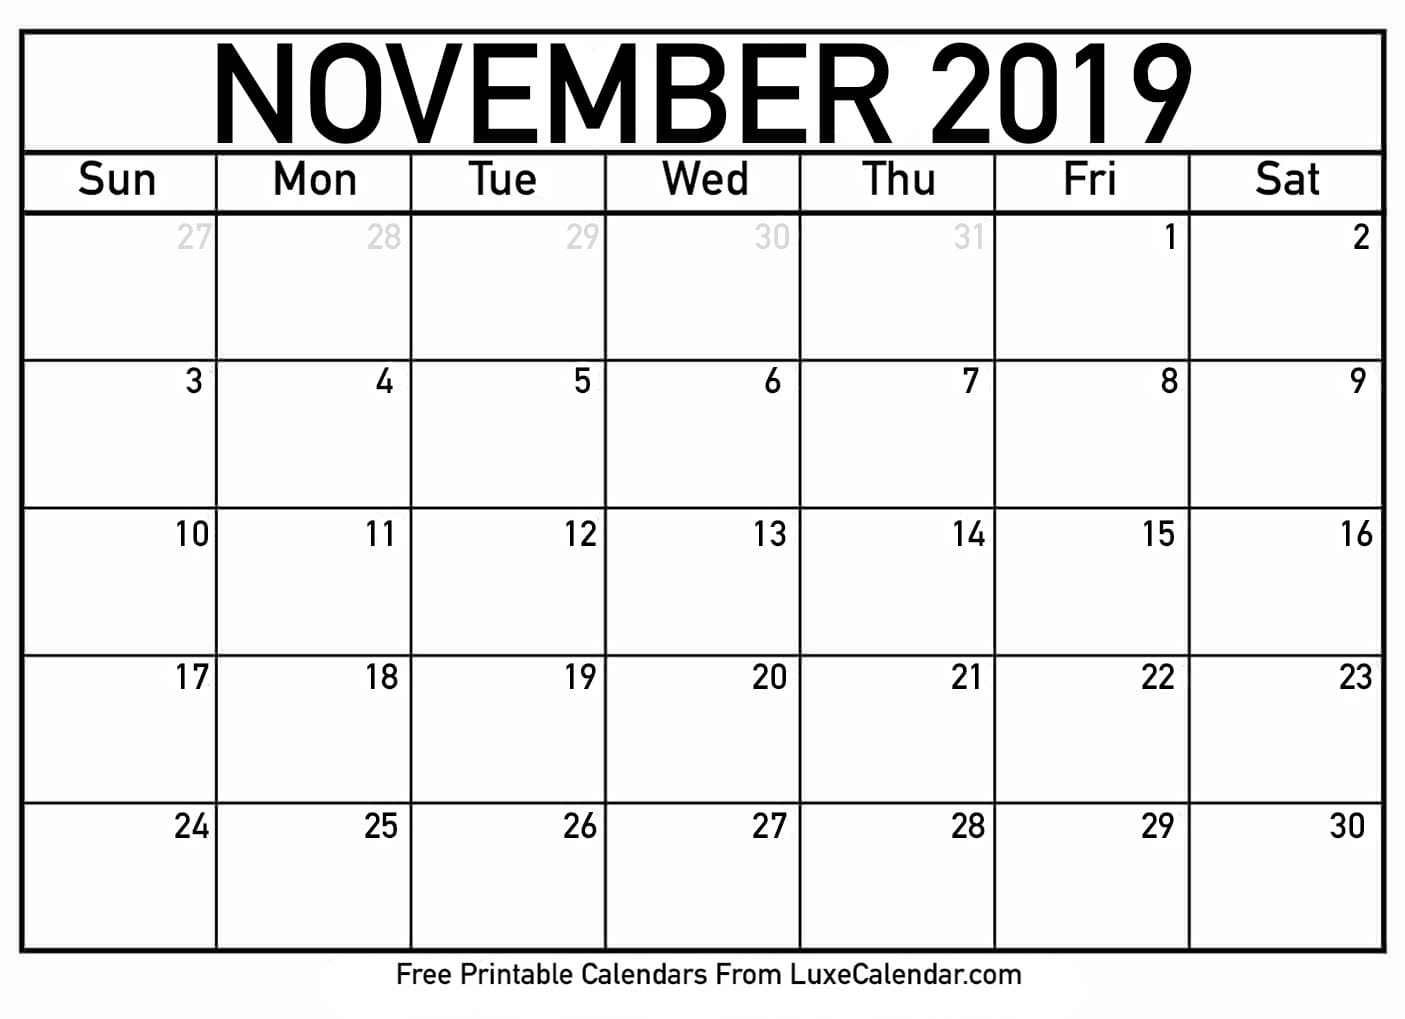 Blank November 2019 Calendar Templates Printable Download - July regarding November Calendar Template Free